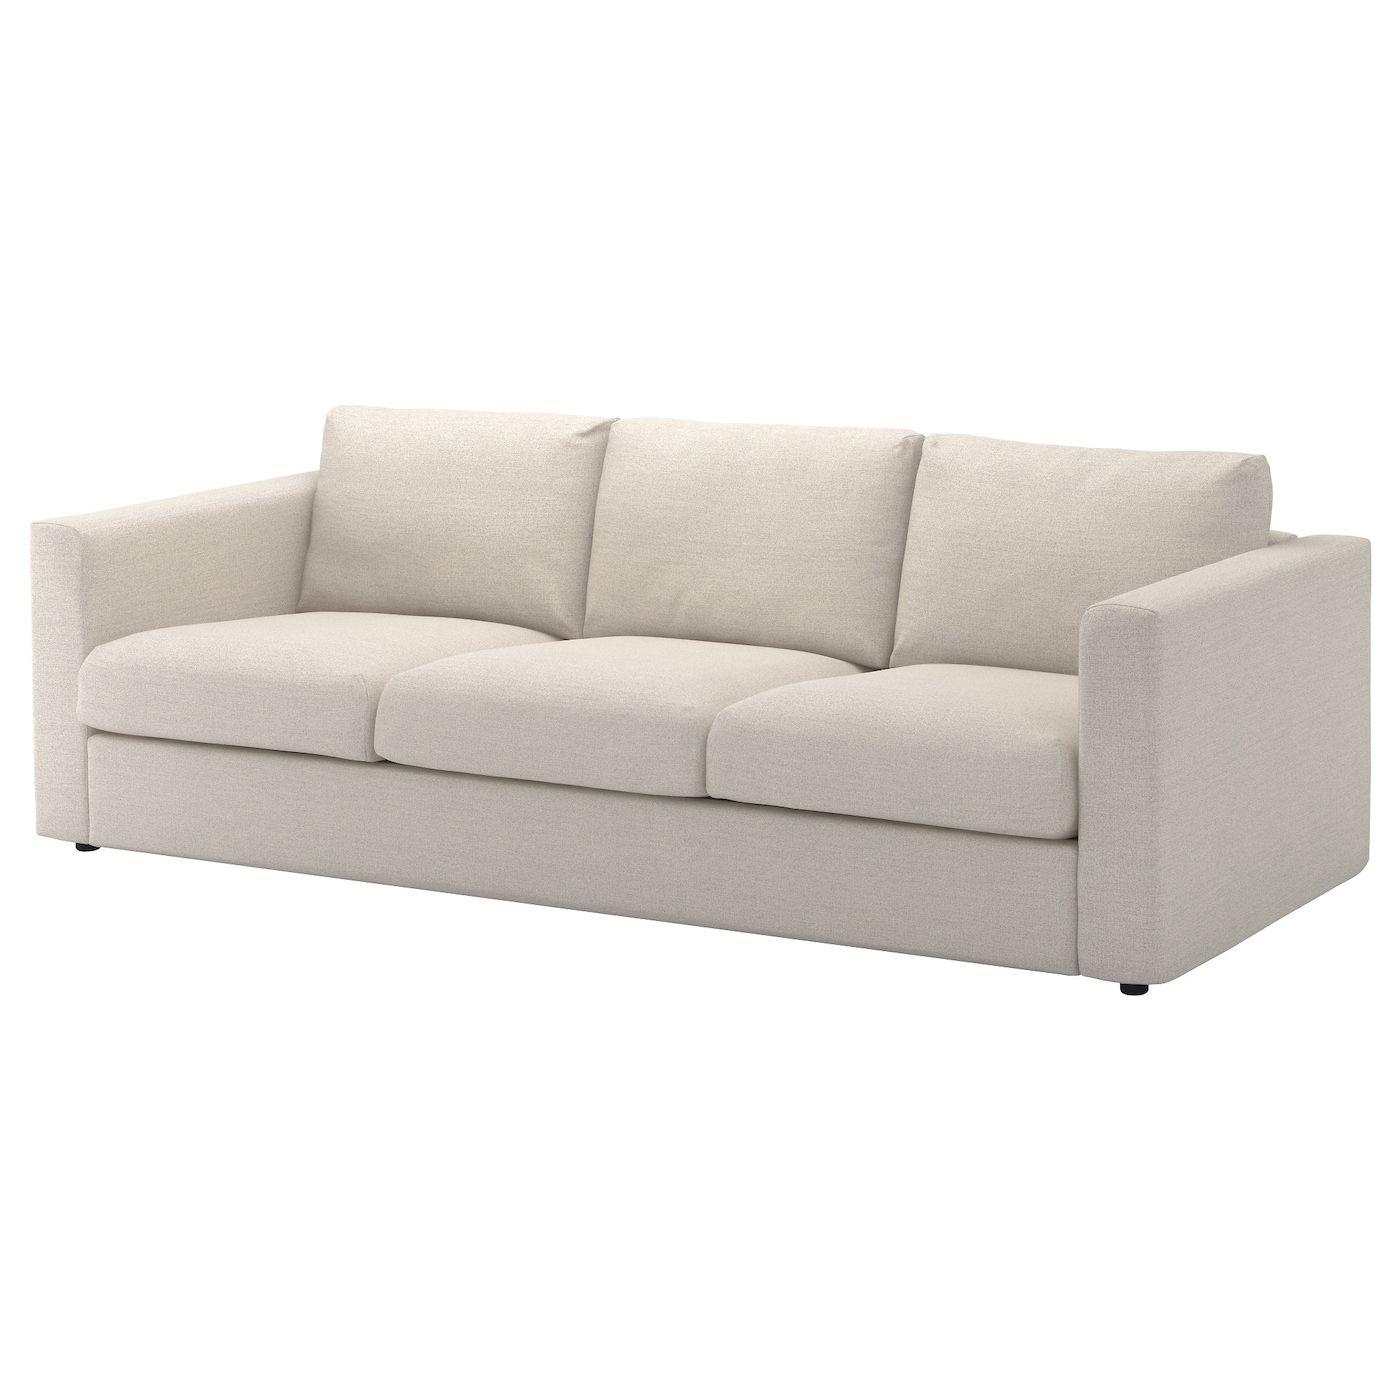 Vimle Bezug 3er Sofa Gunnared Beige Ikea Osterreich Bettsofa 3er Sofa Und Sofa